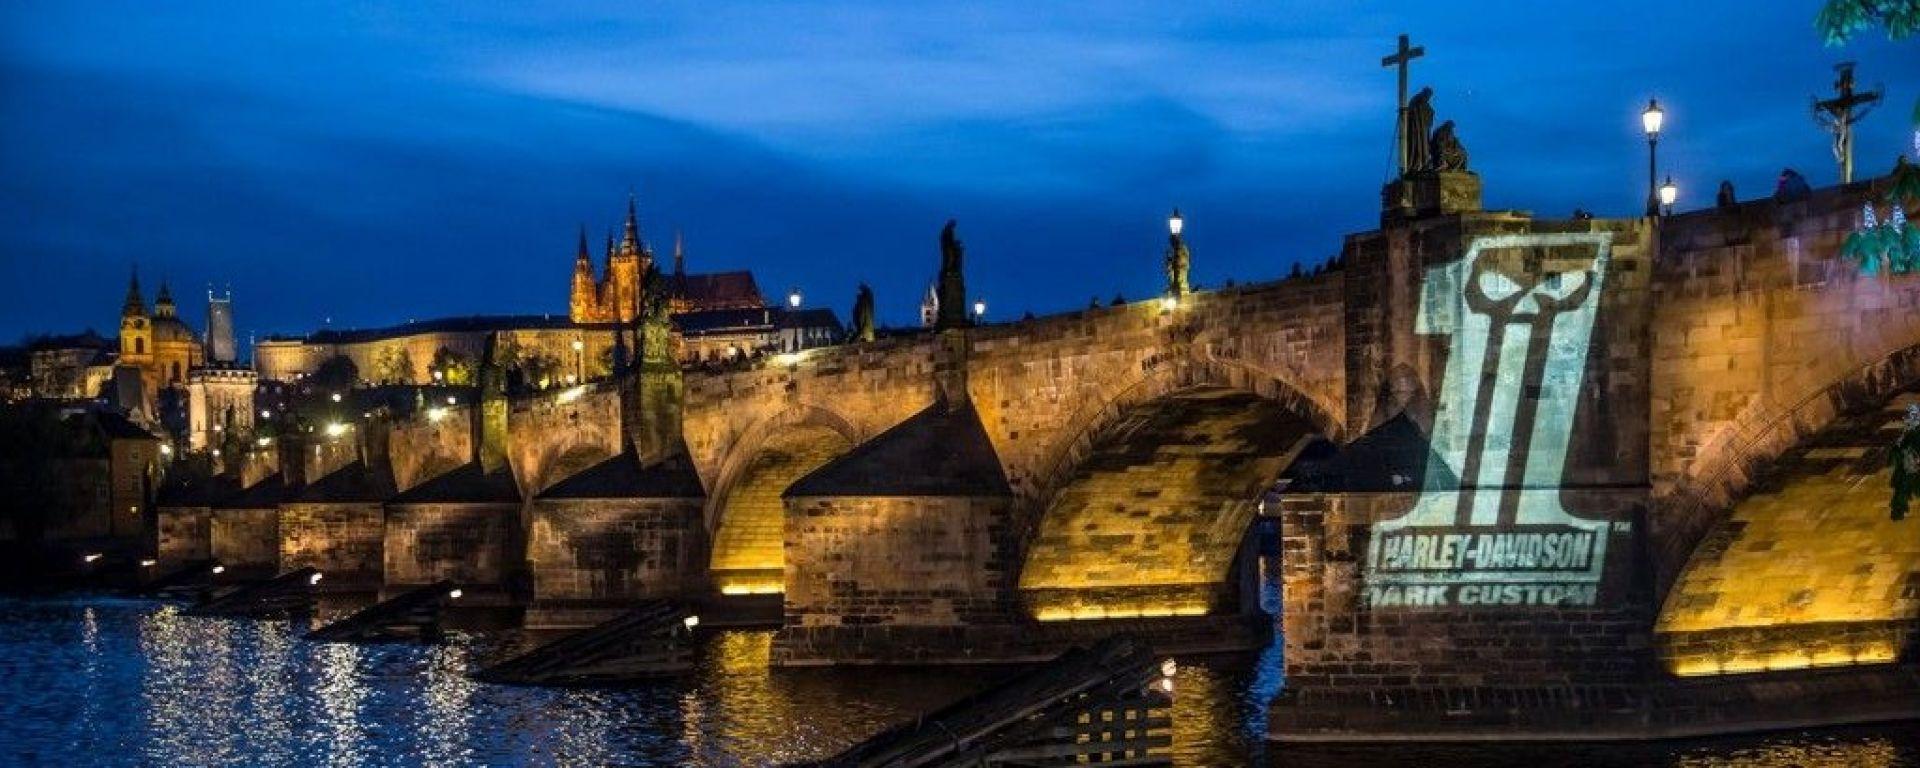 Harley Davidson: tutti a Praga per i 115 anni di attività